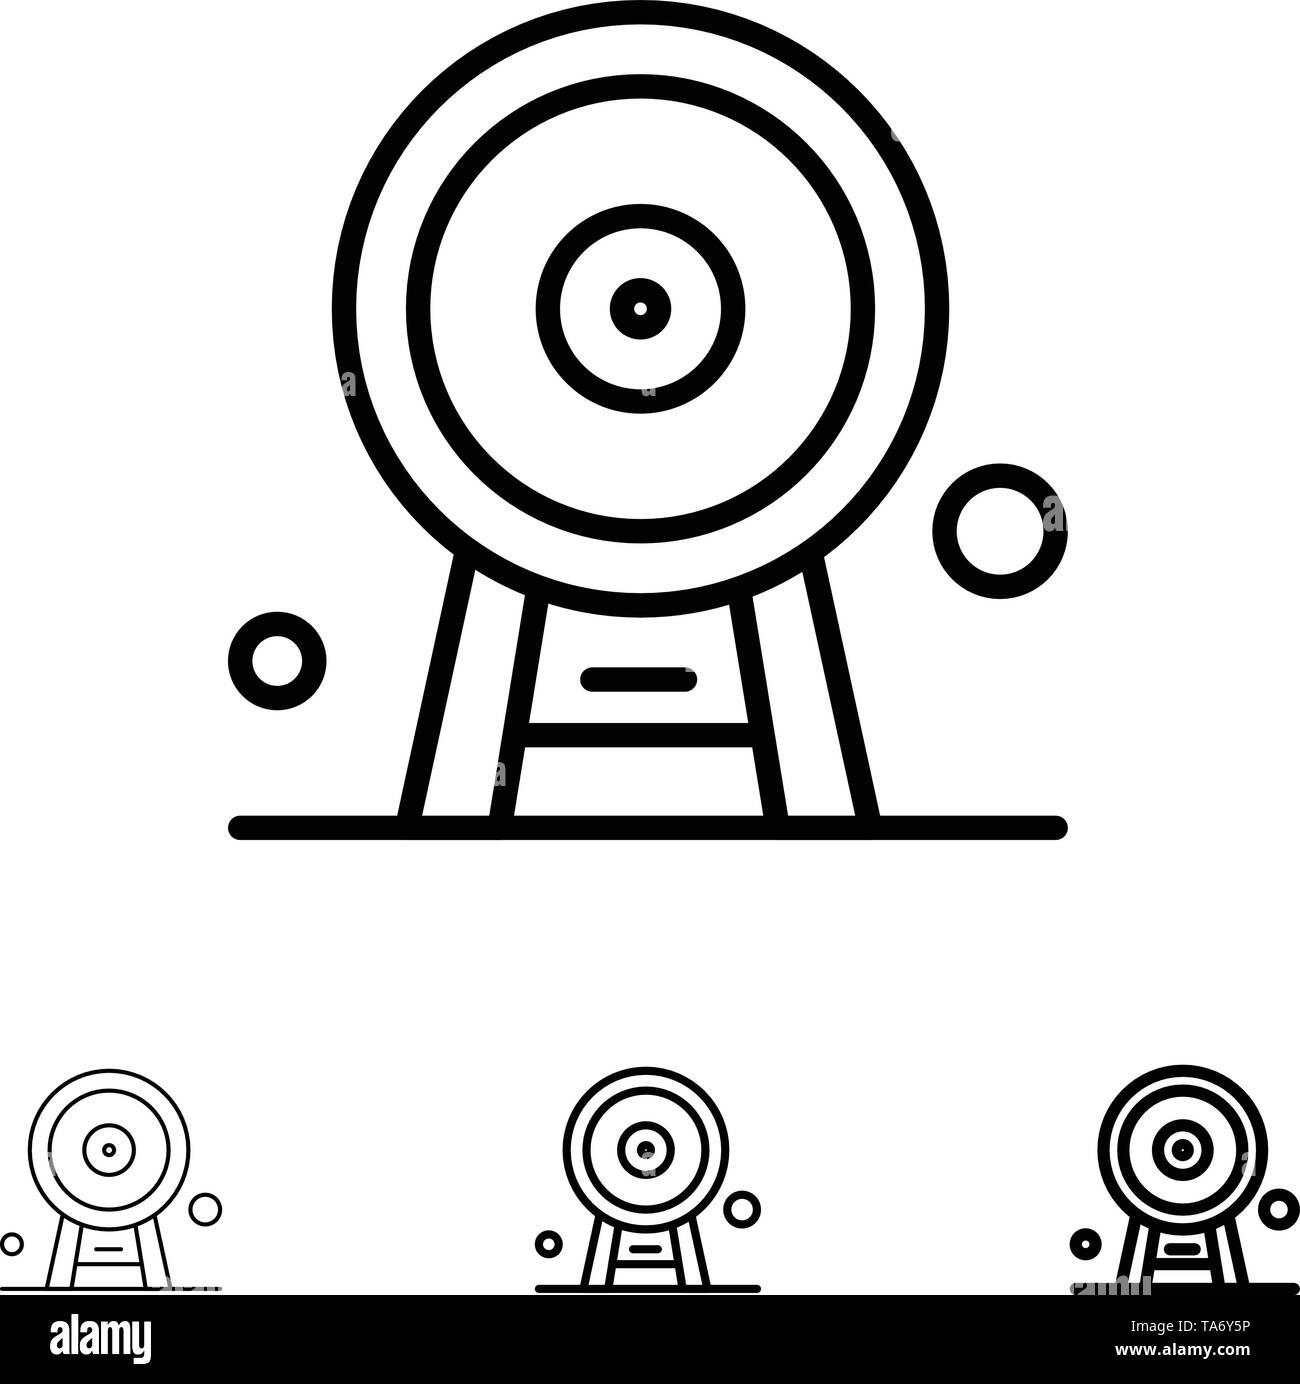 Architecture, England, Ferris Wheel, Landmark, London Eye, Bold and thin black line icon set - Stock Image